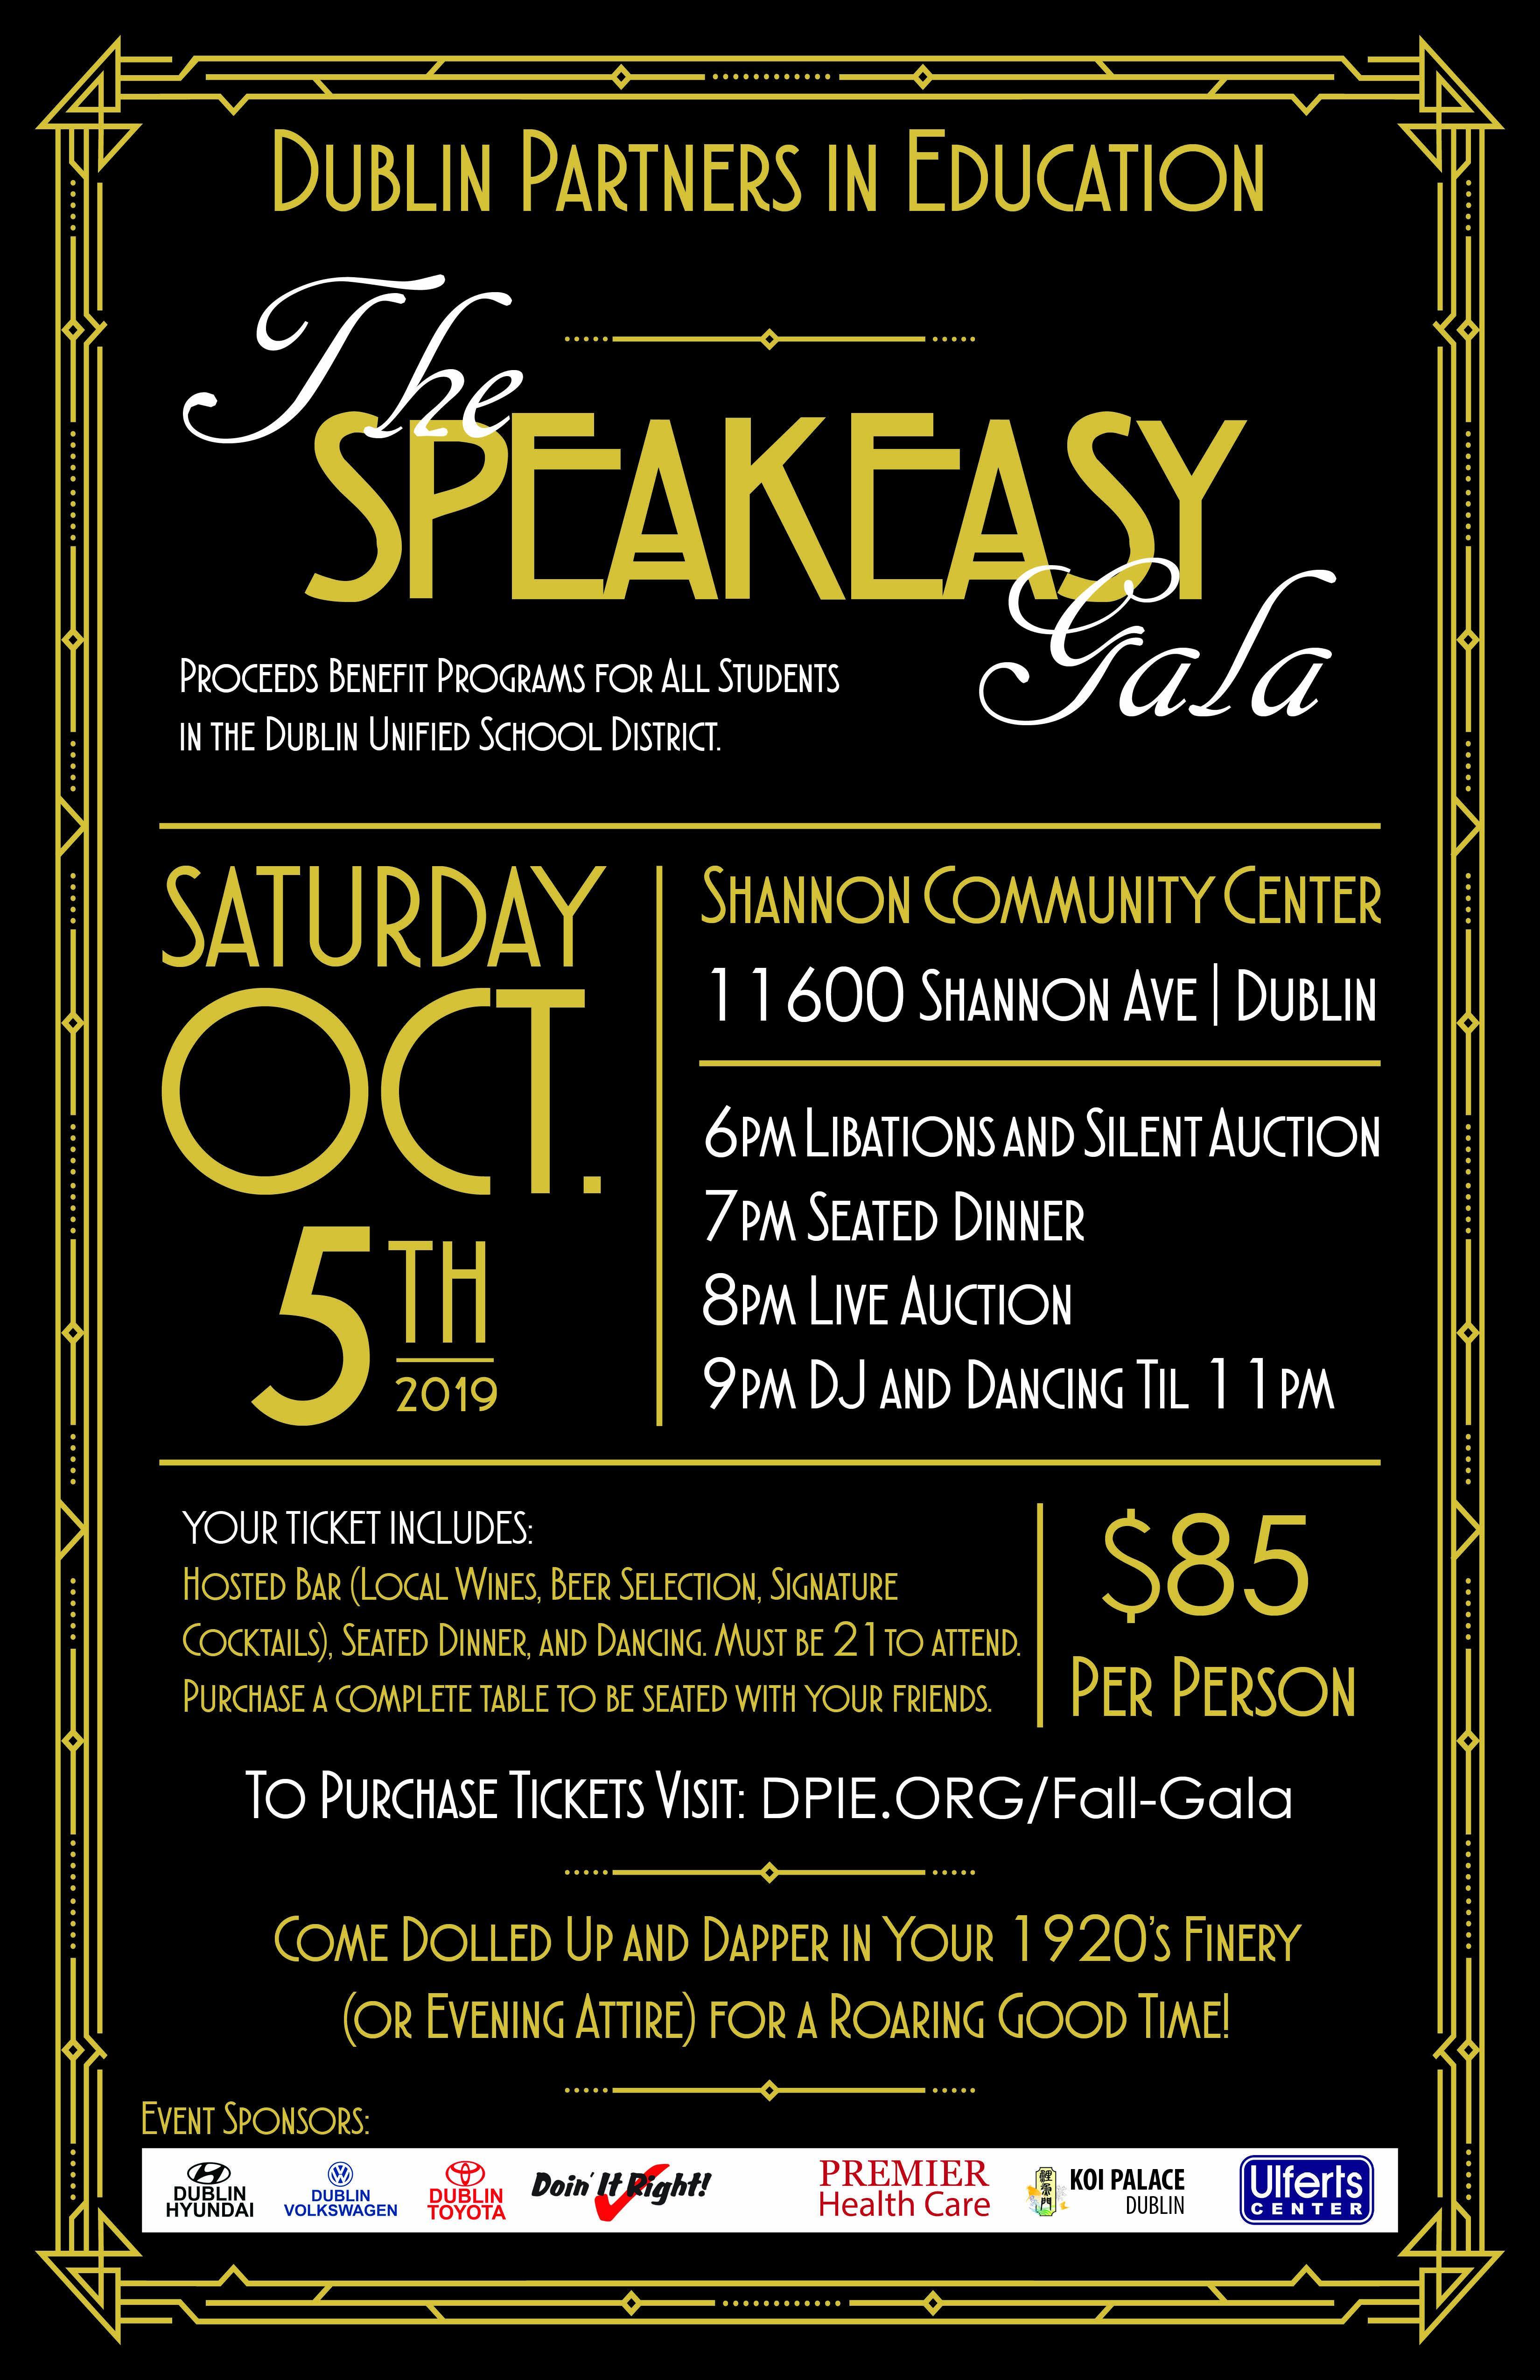 The Speakeasy Gala Poster